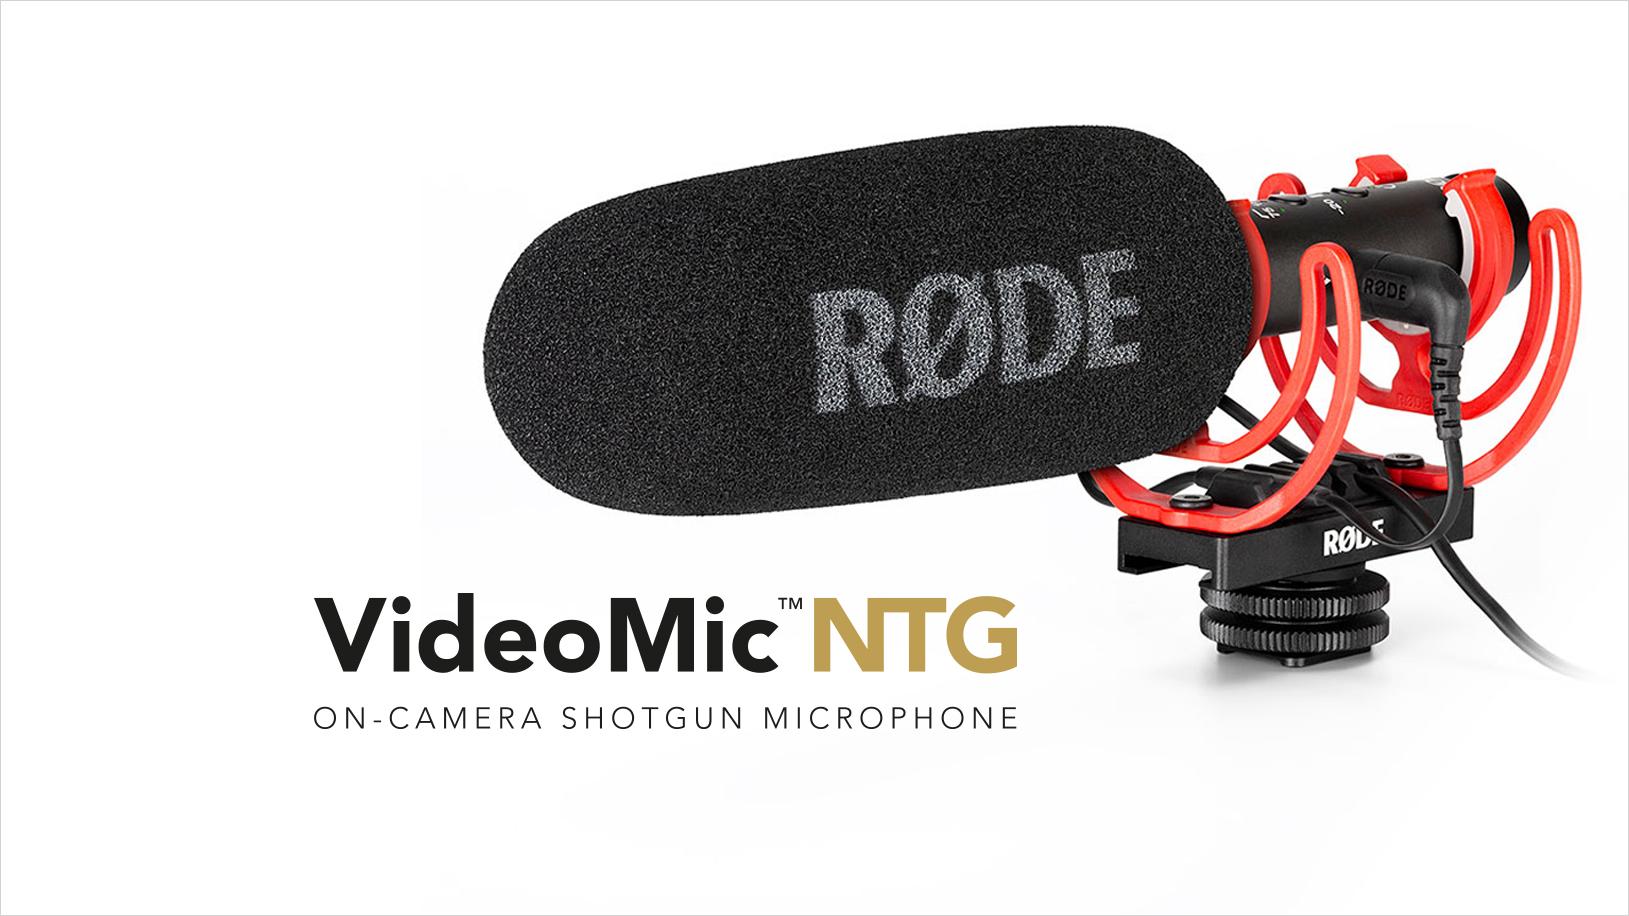 RØDE VideoMic NTG